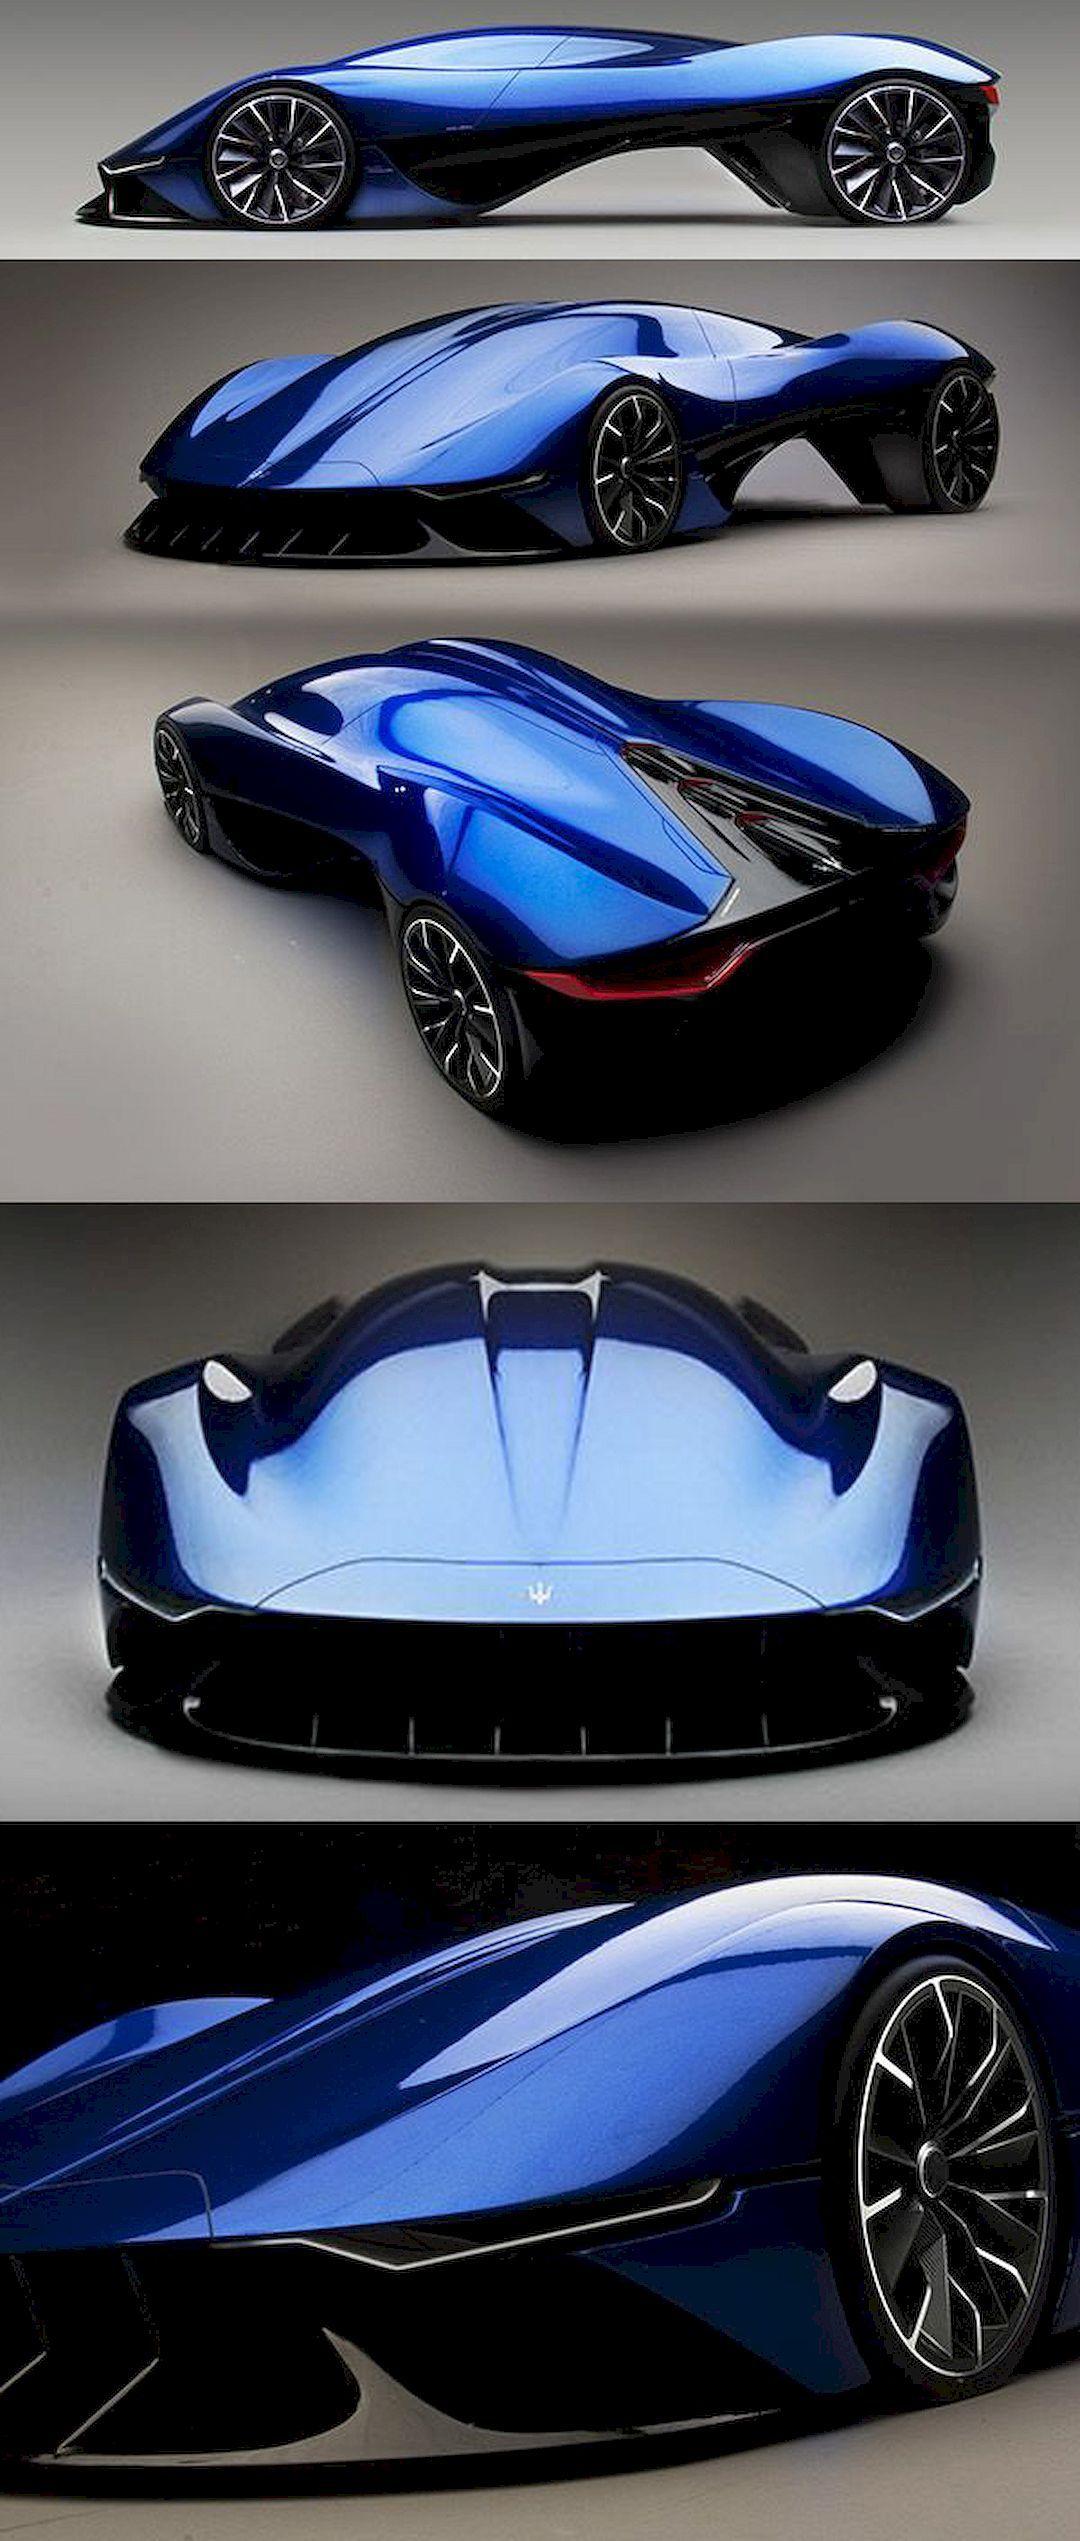 Toyota Car – FT-X Race Car: A Conceptual Design Project of A Futuristic Race Car | Design Listicle